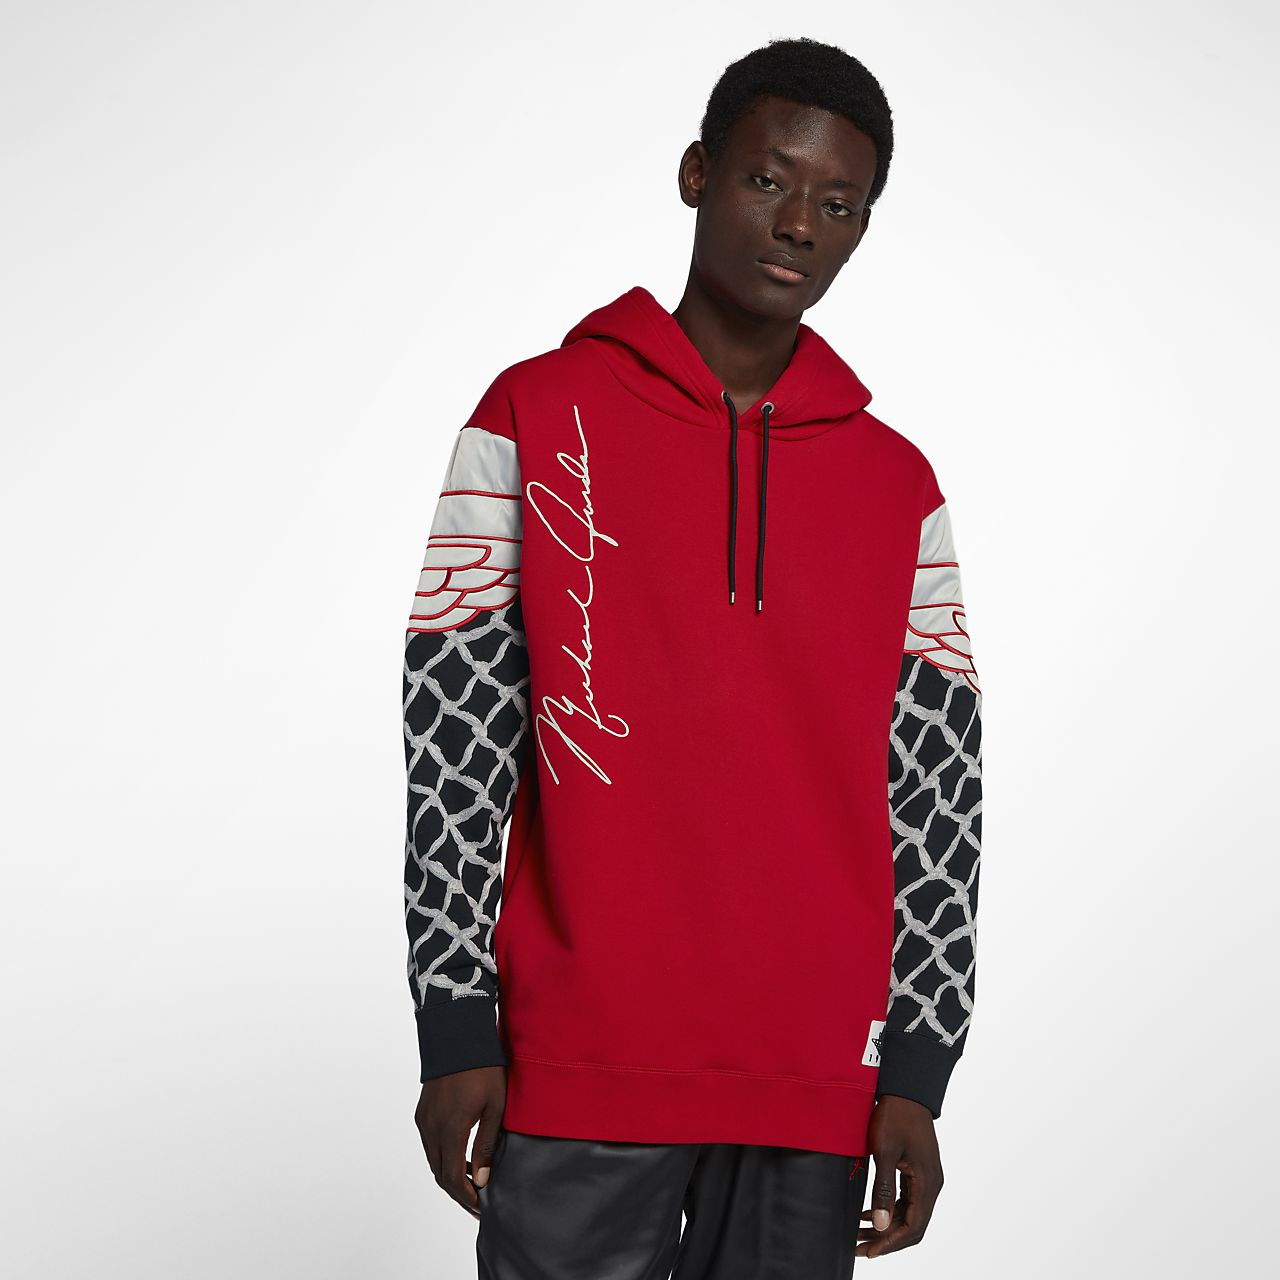 5b595faf1fd1 Jordan Sportswear Pinnacle Men s Pullover Hoodie. Nike.com CA